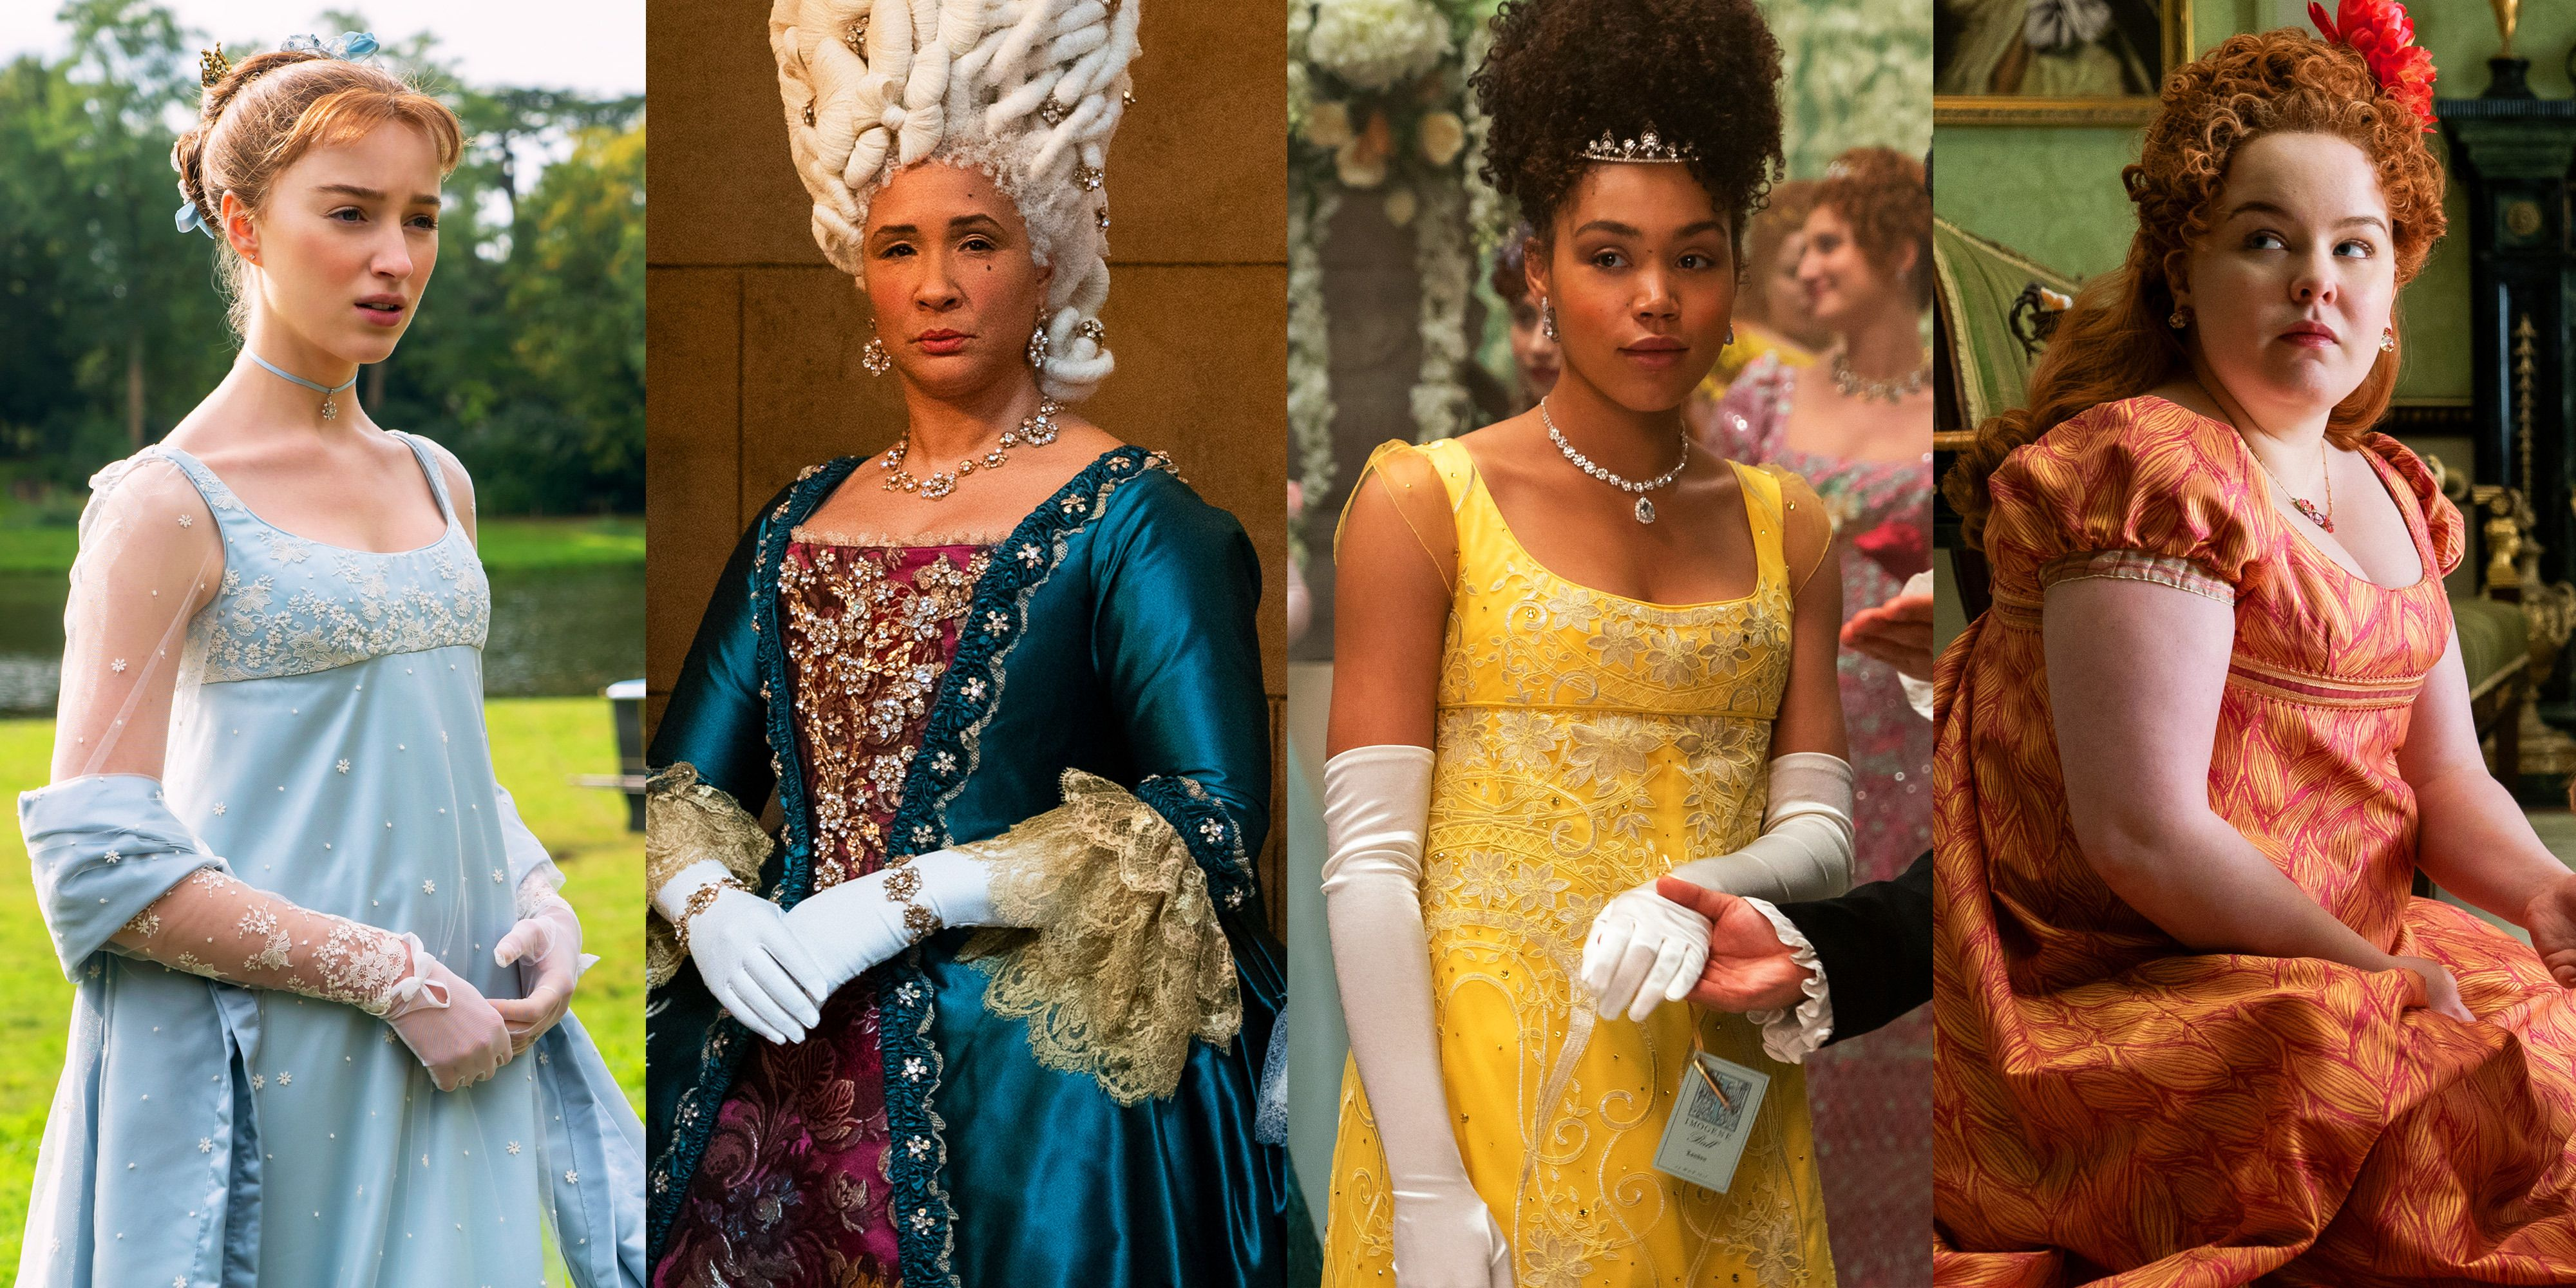 40 Best 'Bridgerton' Fashion Moments in Netflix Series